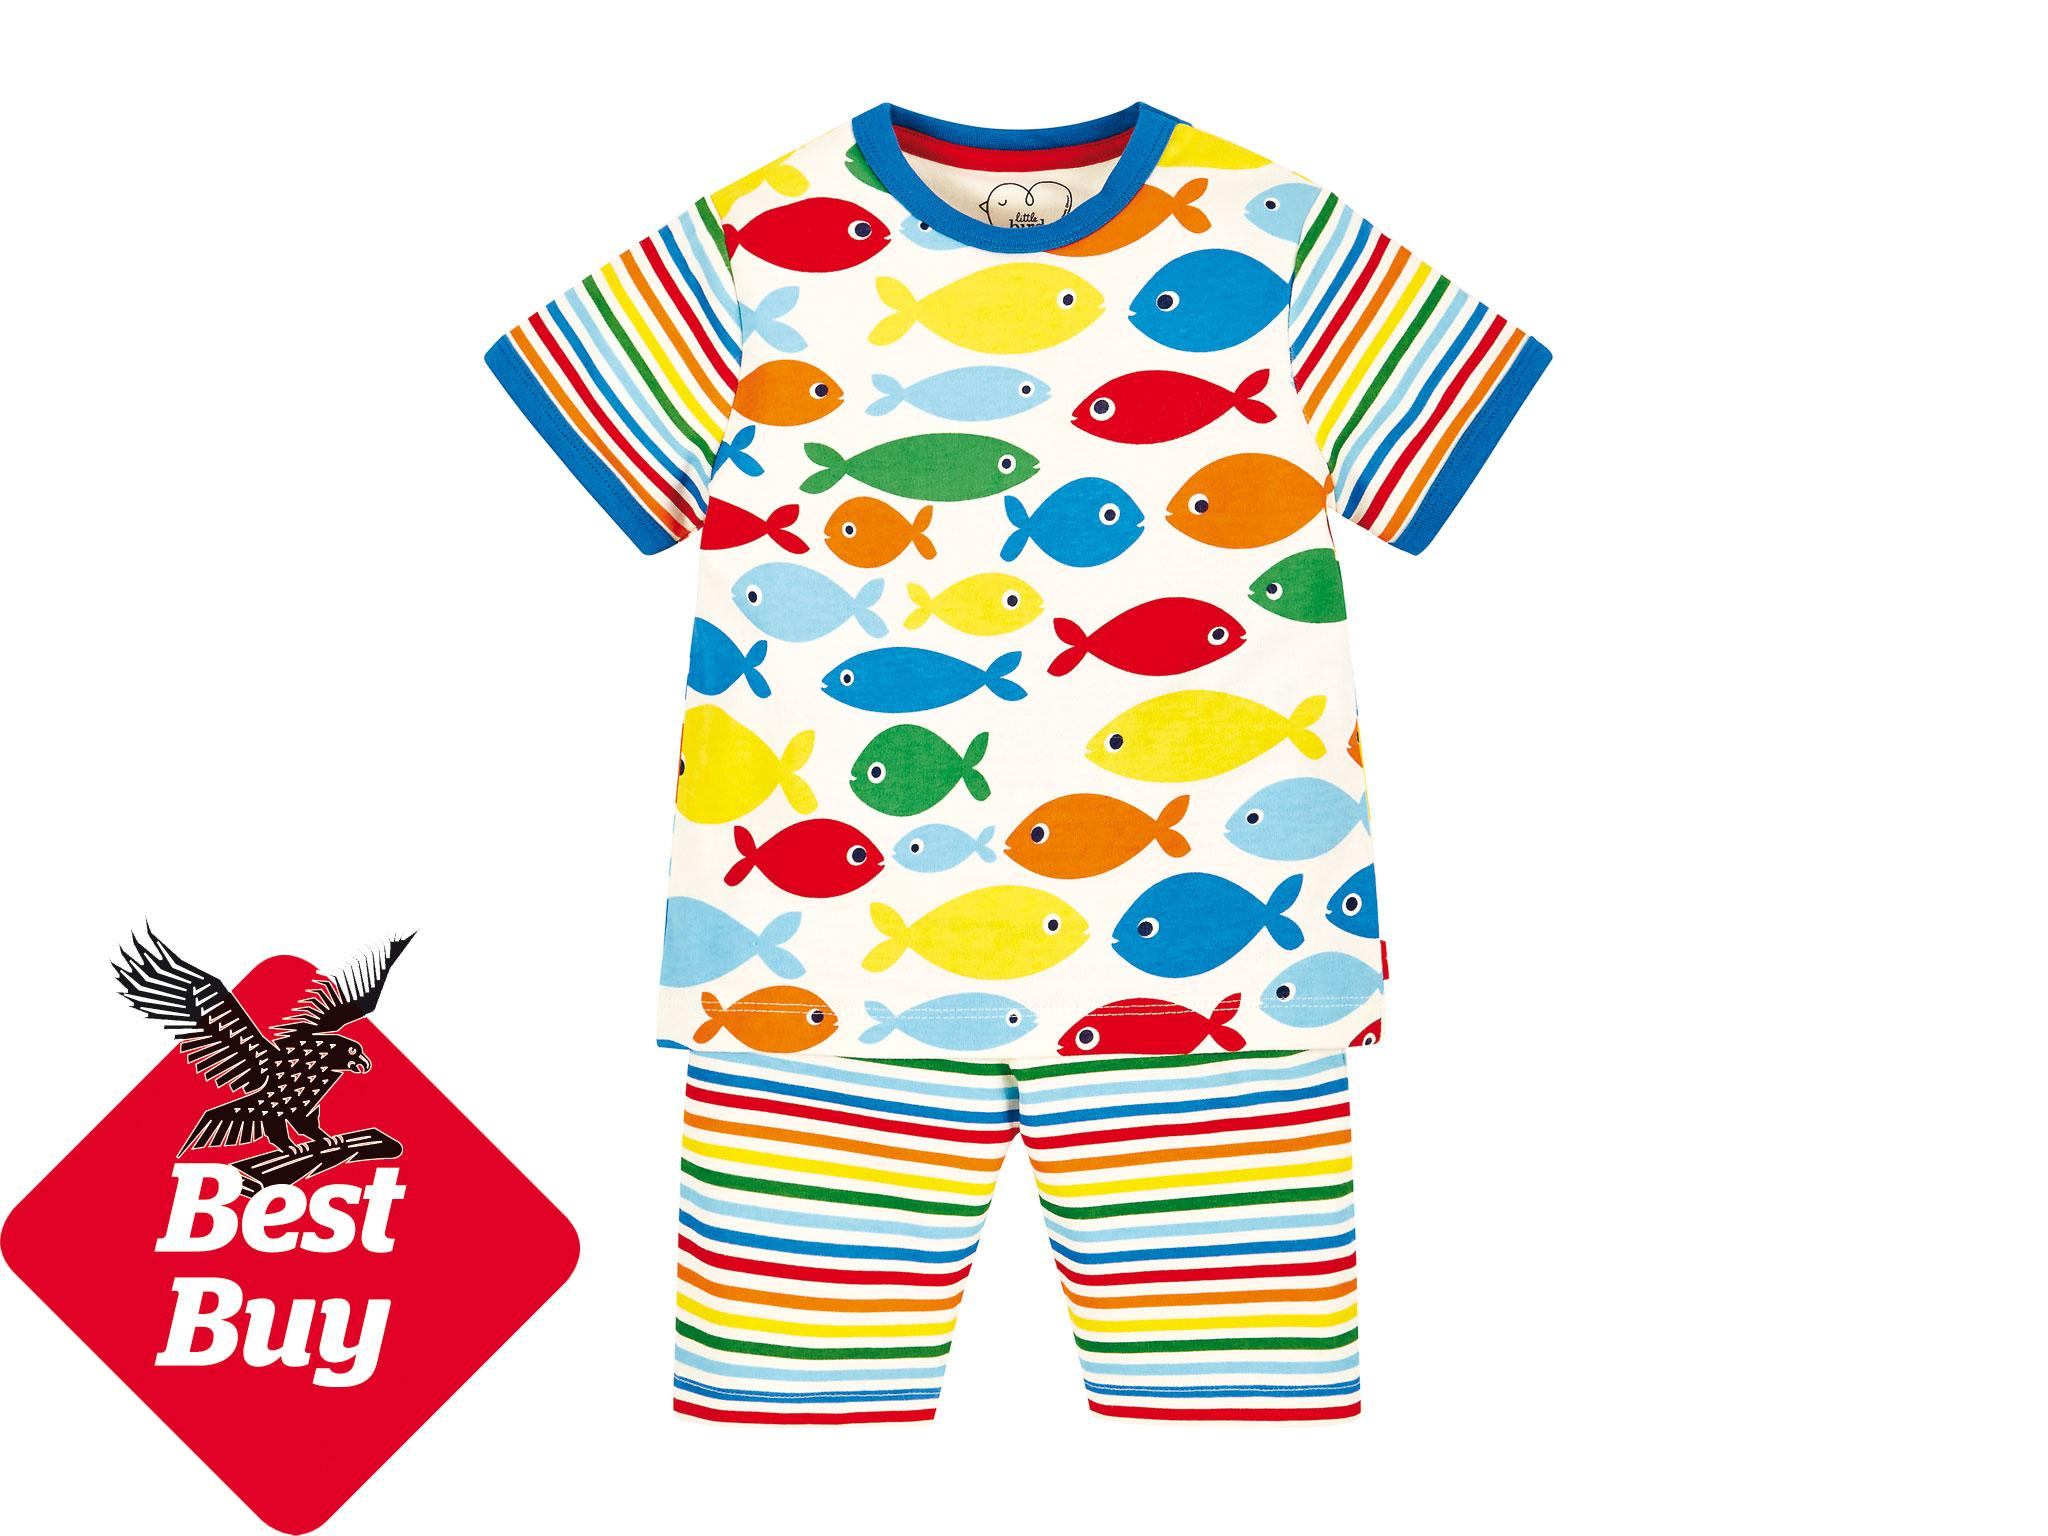 Mini Boden girls pajama short john  3 4 5 6 8 9 10 11 12 years red striped